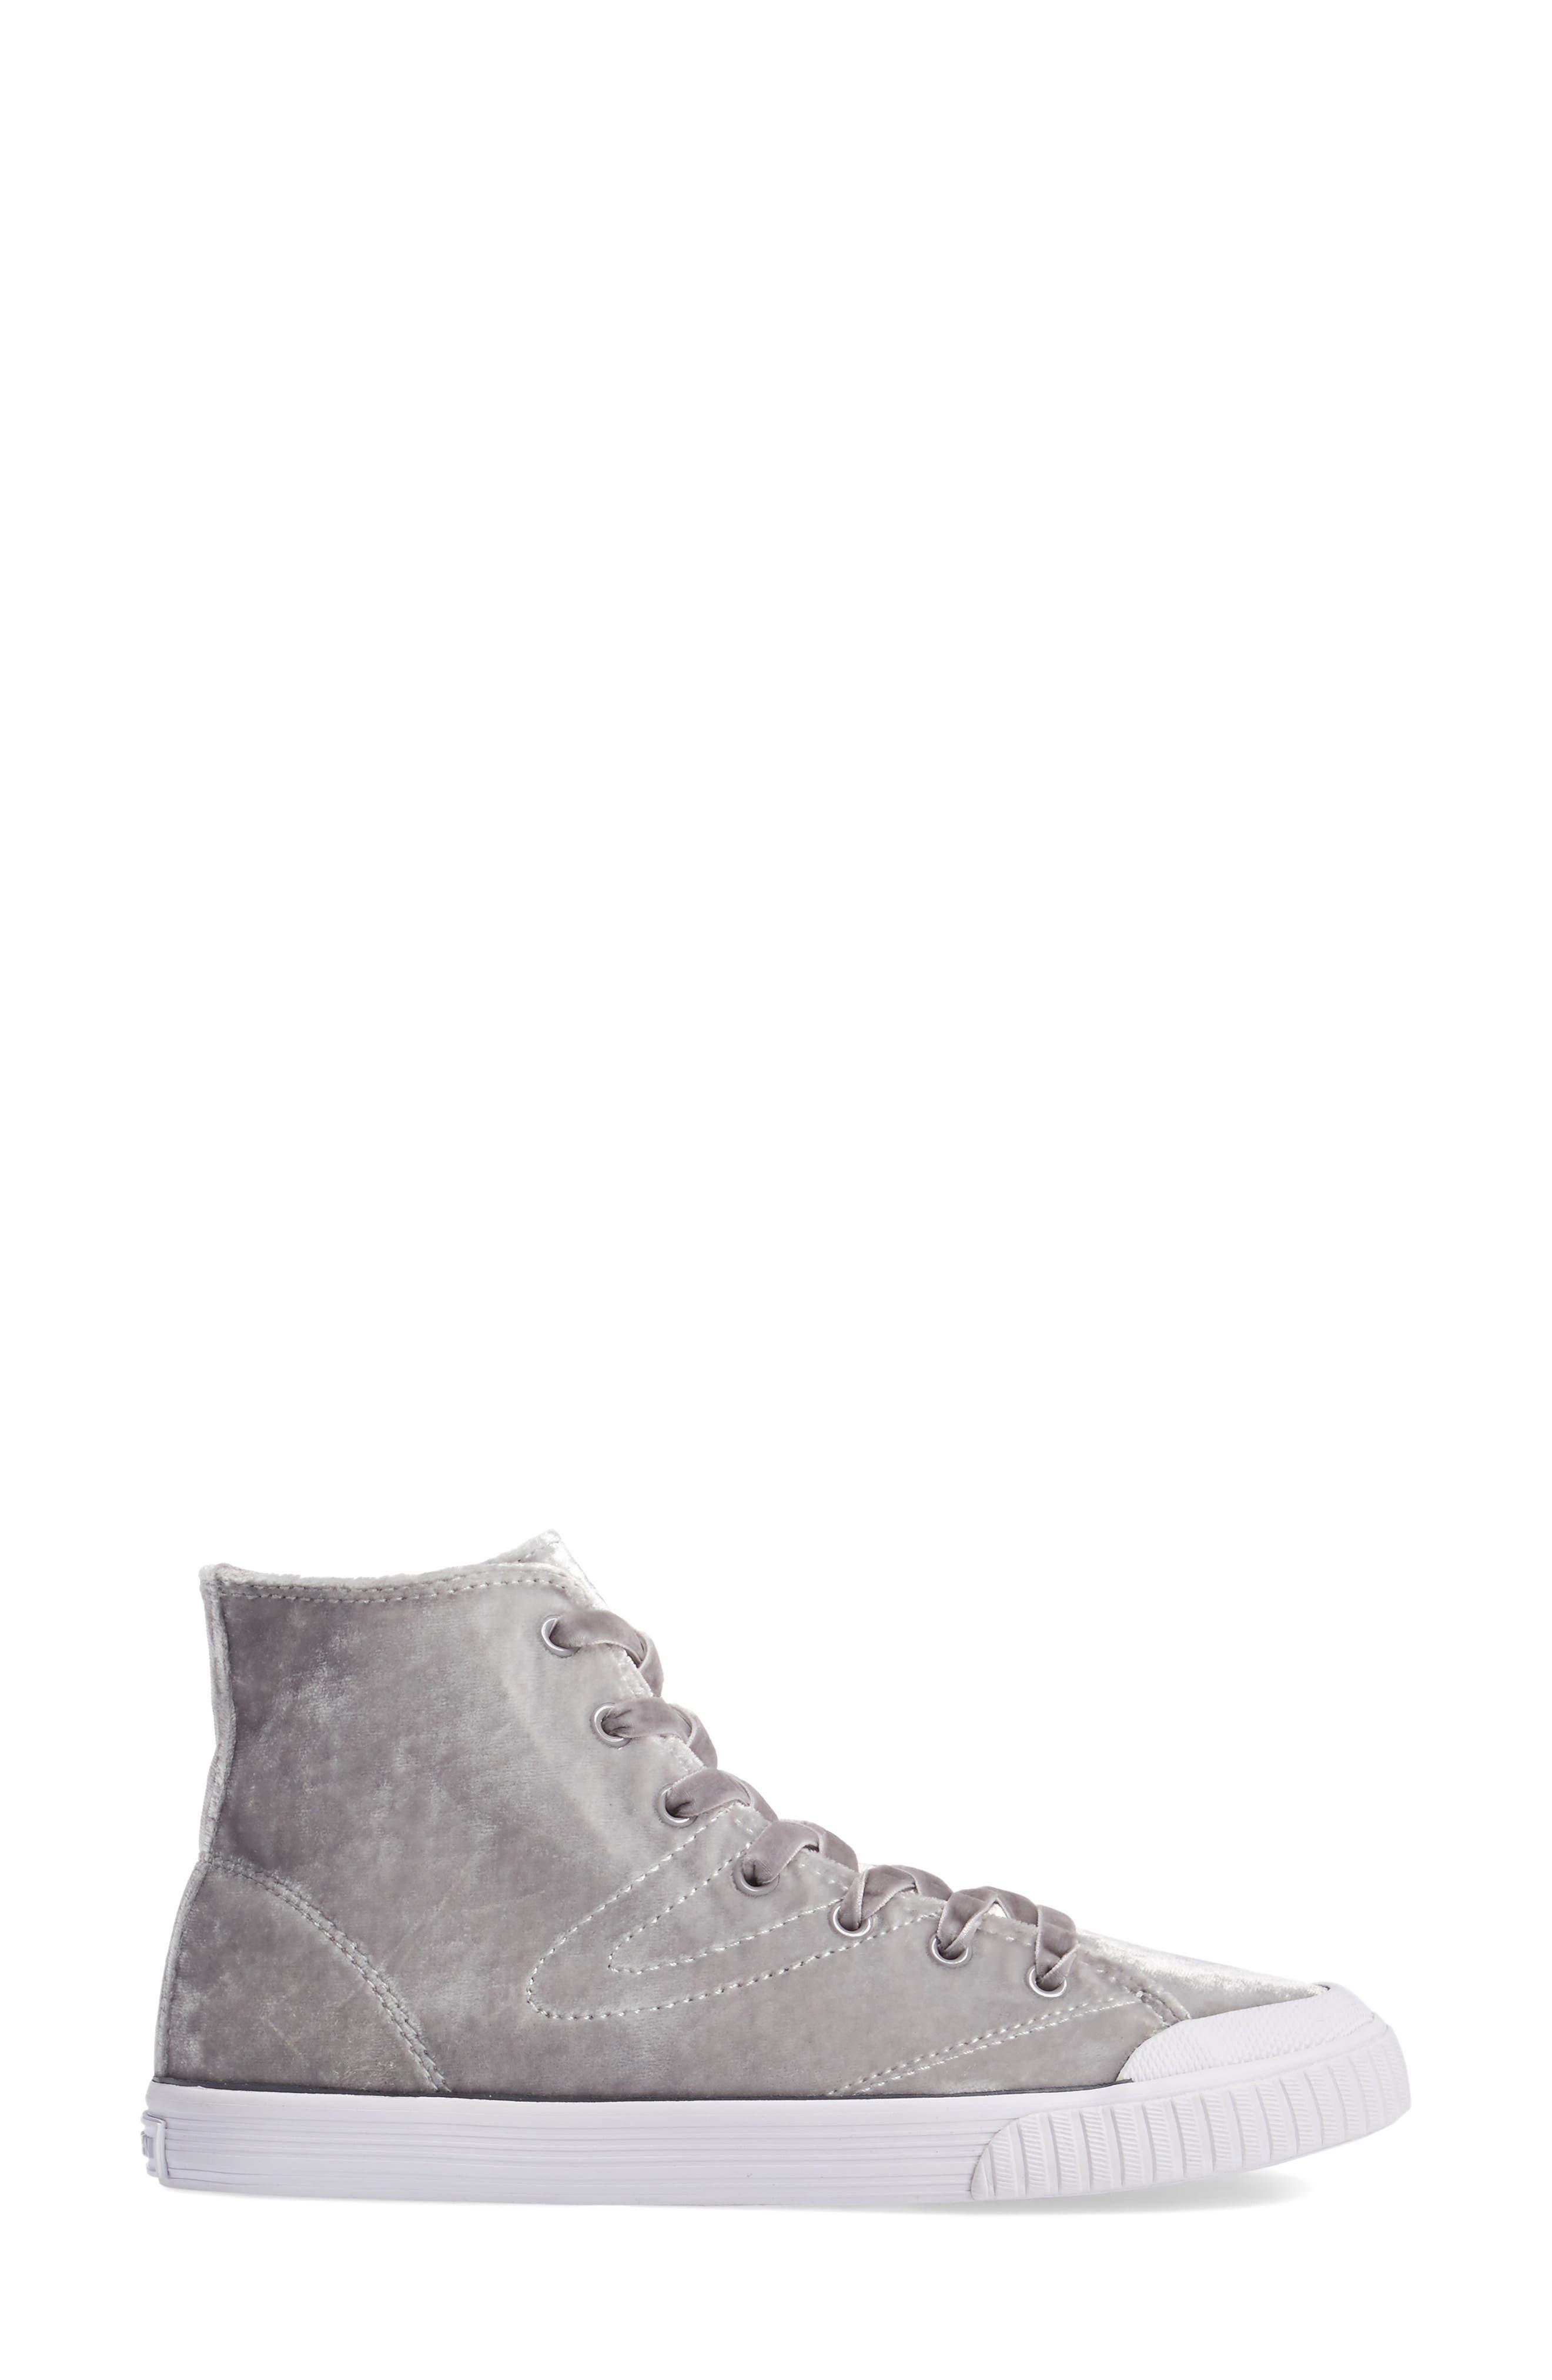 Alternate Image 3  - Tretorn Marley 2 High Top Sneaker (Women)